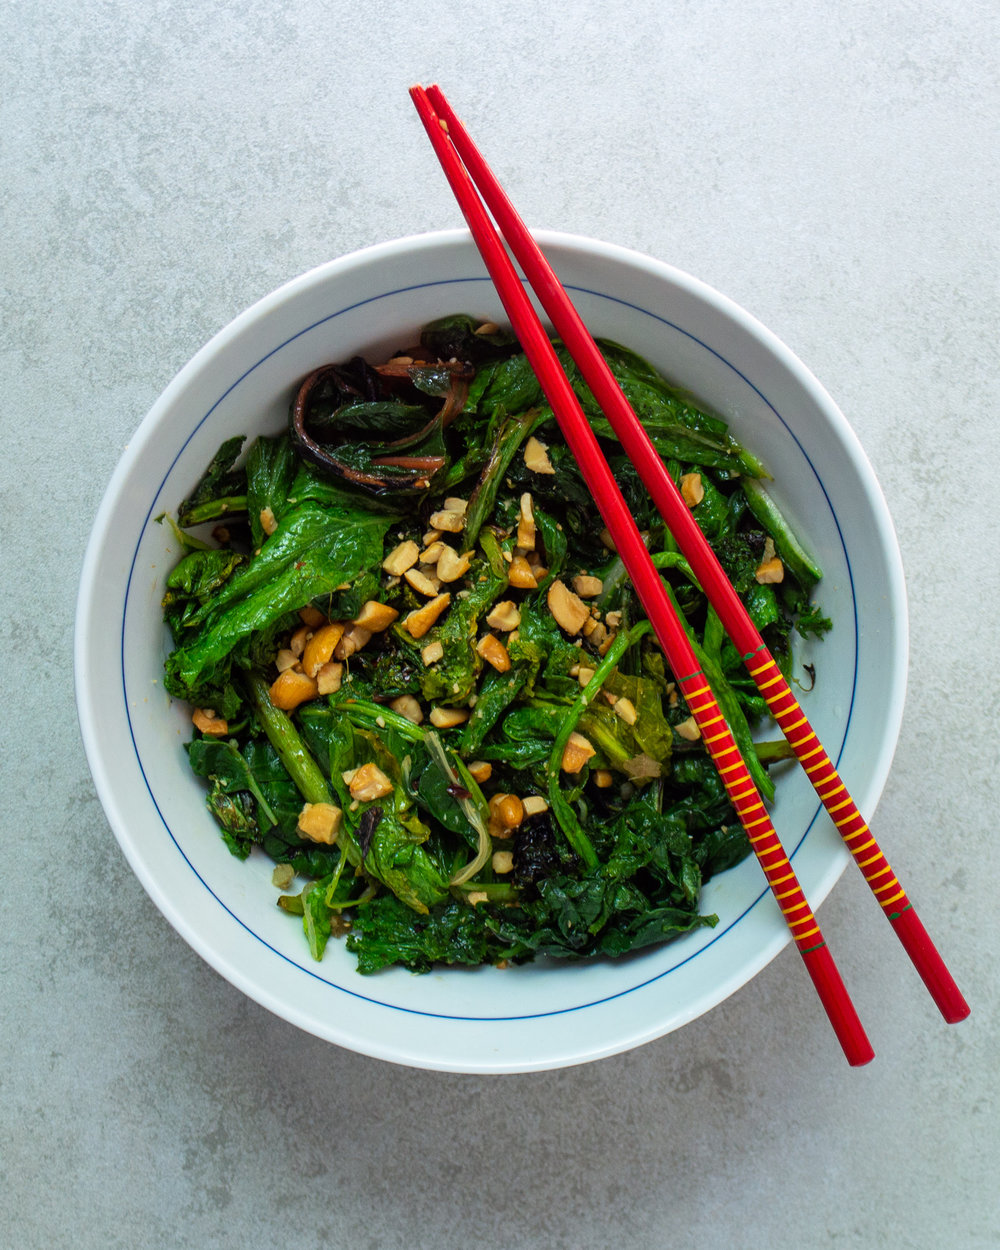 stir-fried greens